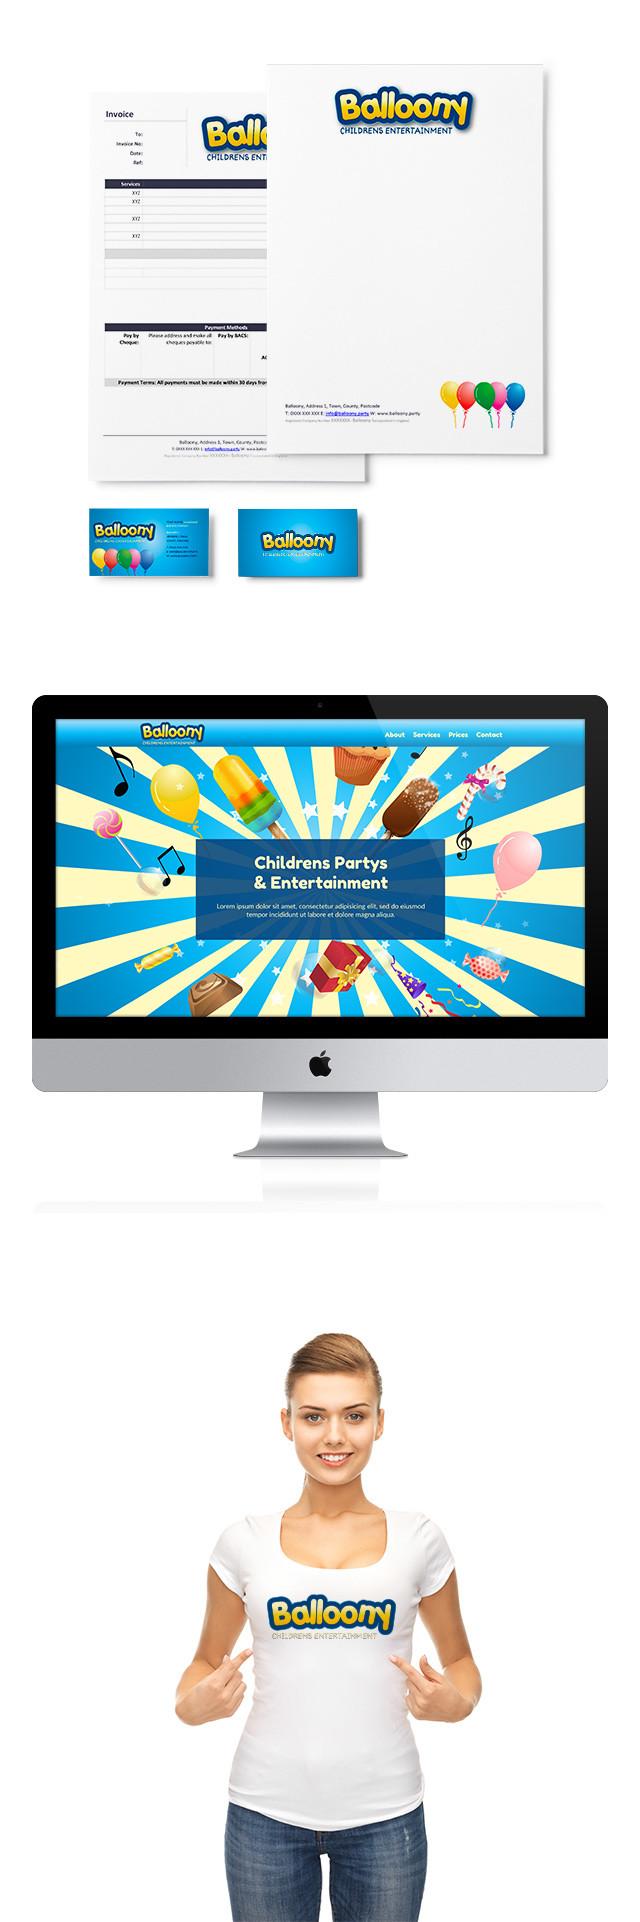 ballon childrens entertainment logo